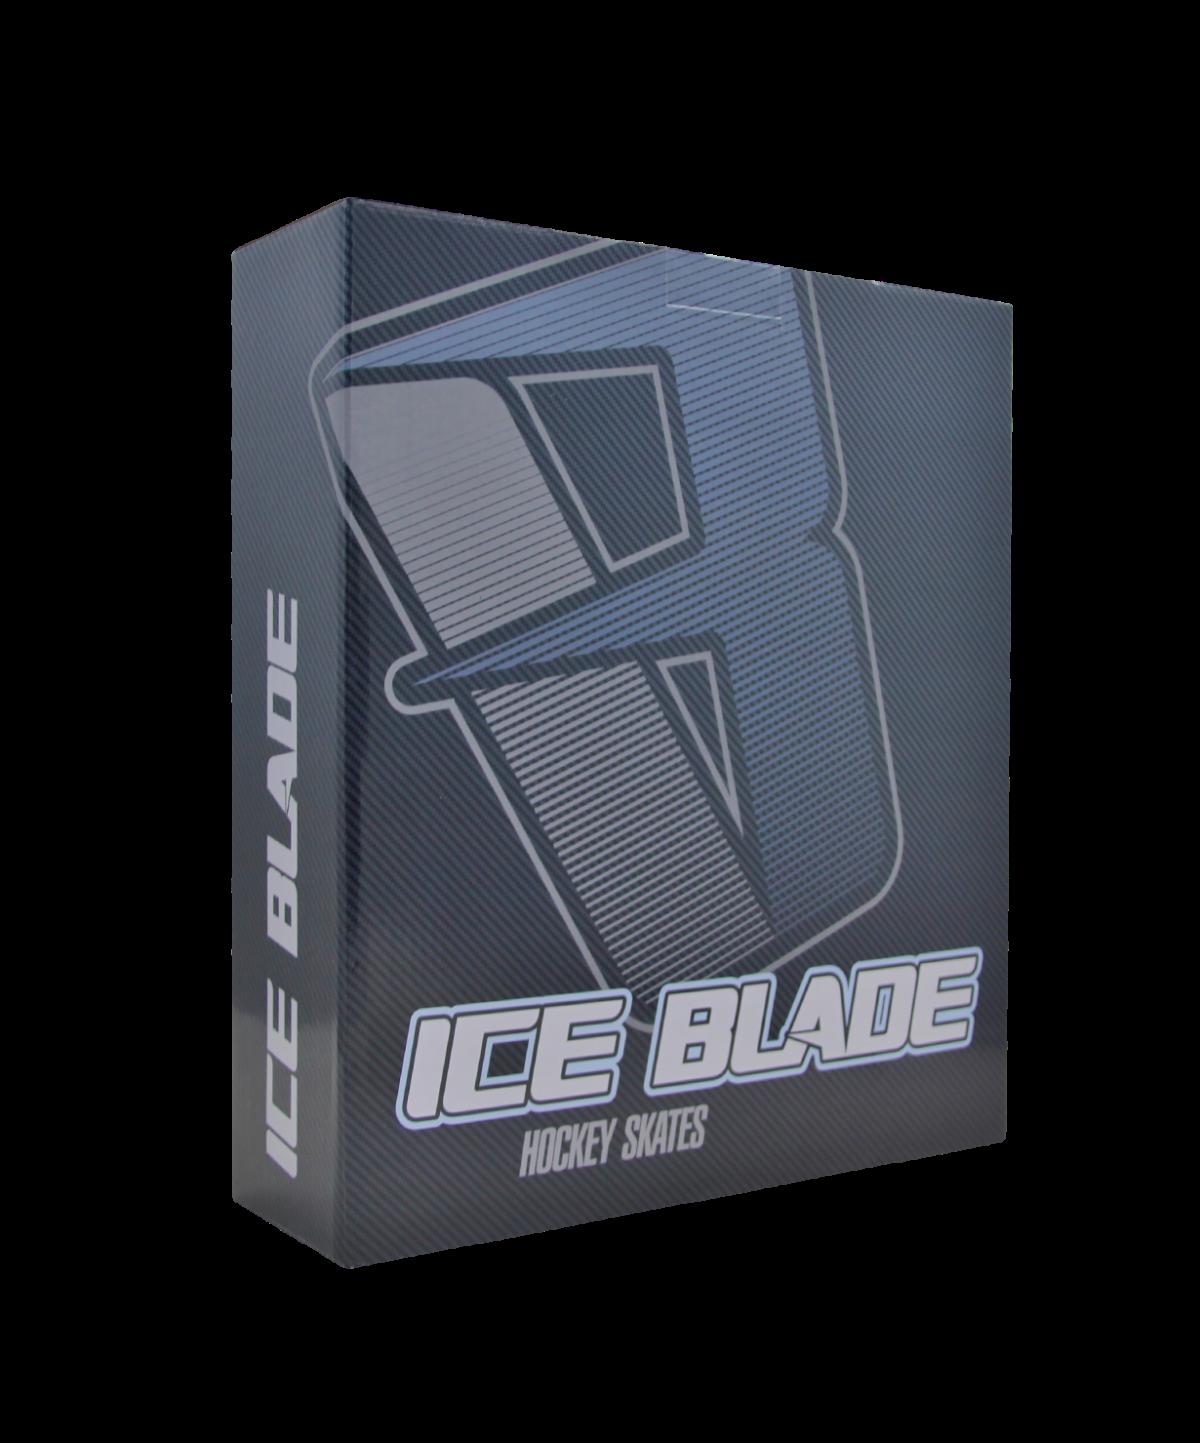 ICE BLADE Коньки хоккейные Revo Х7.0 - 7